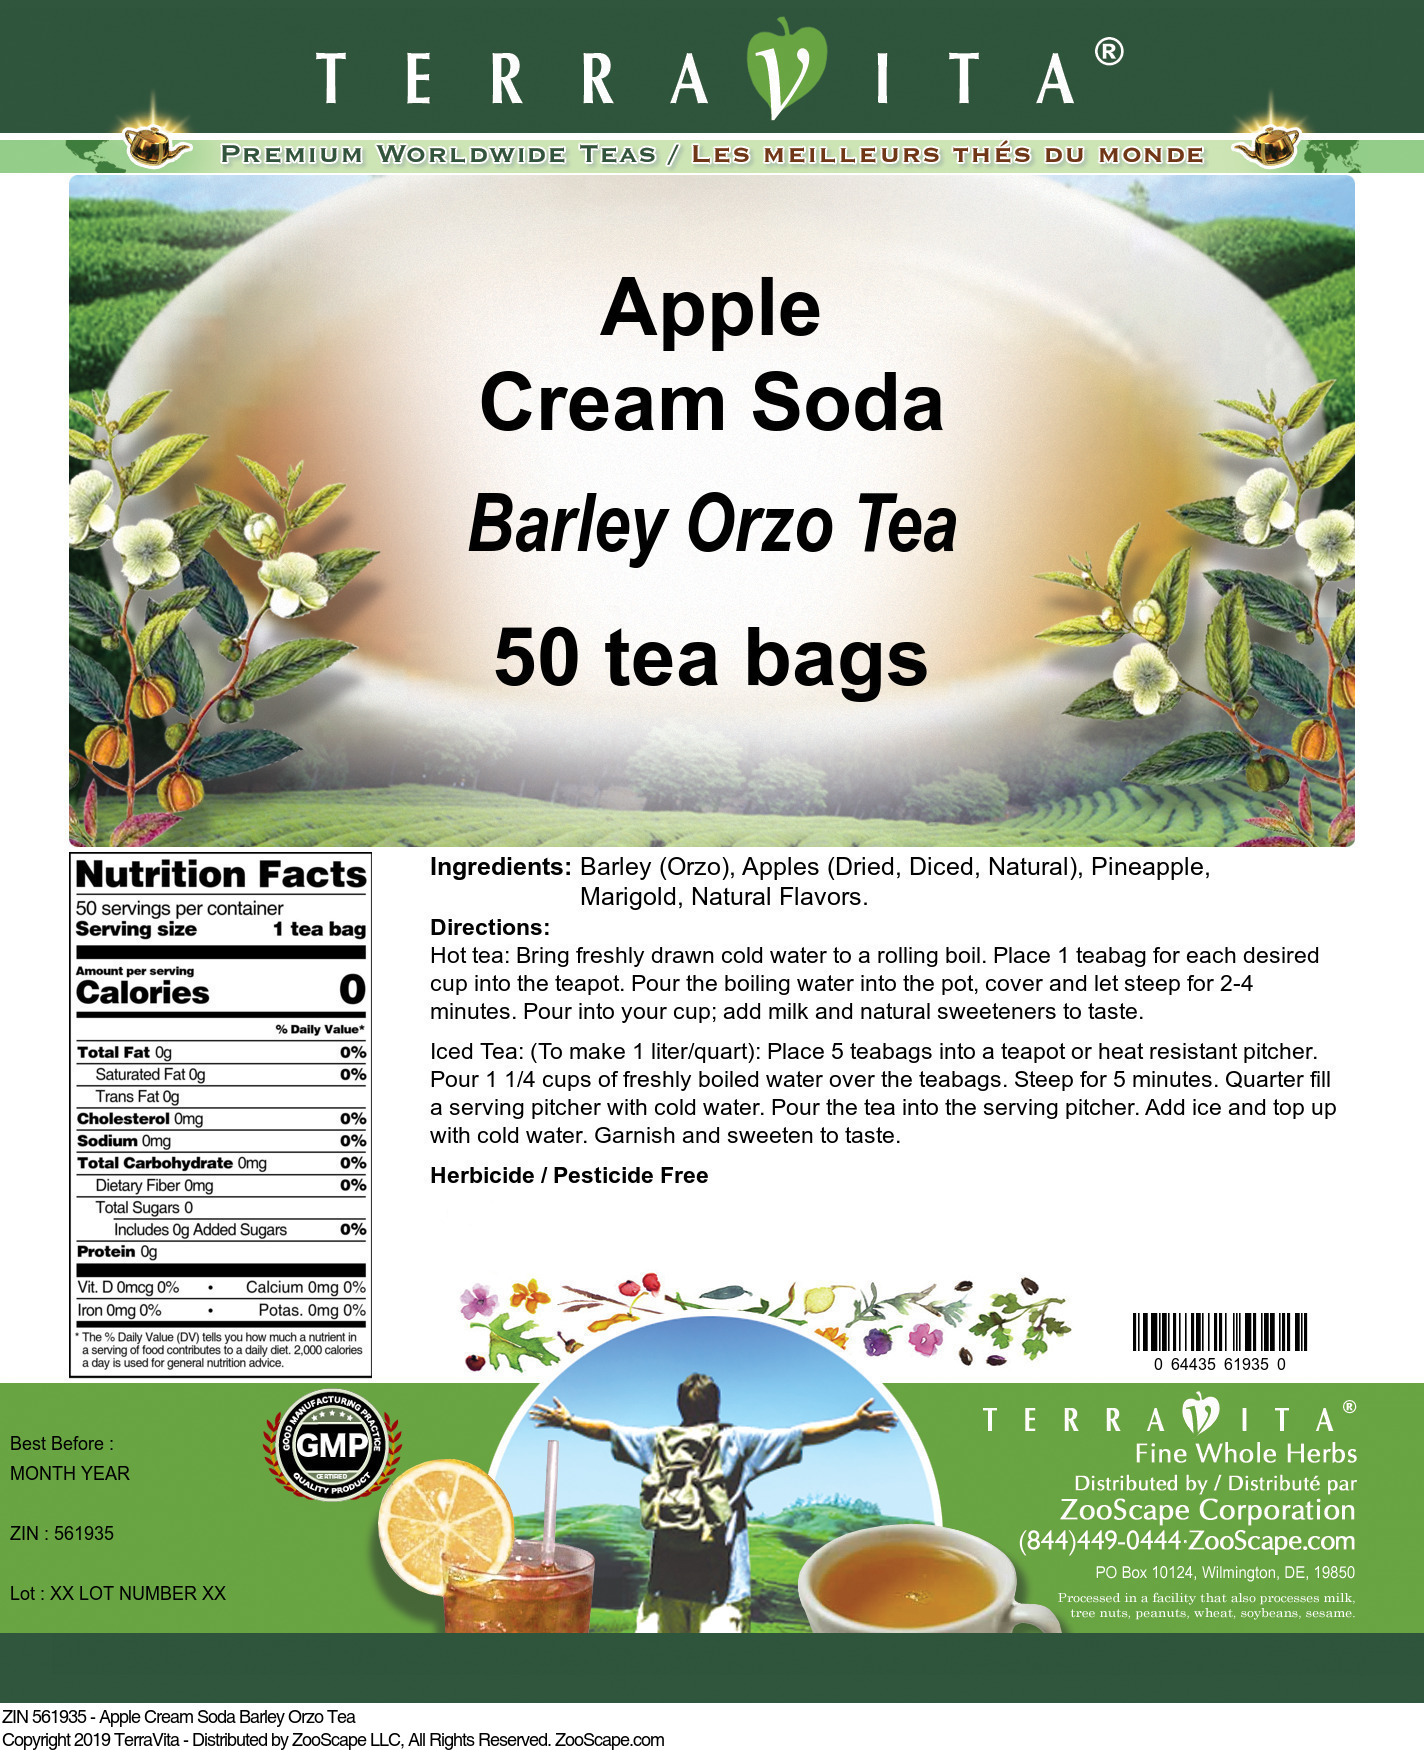 Apple Cream Soda Barley Orzo